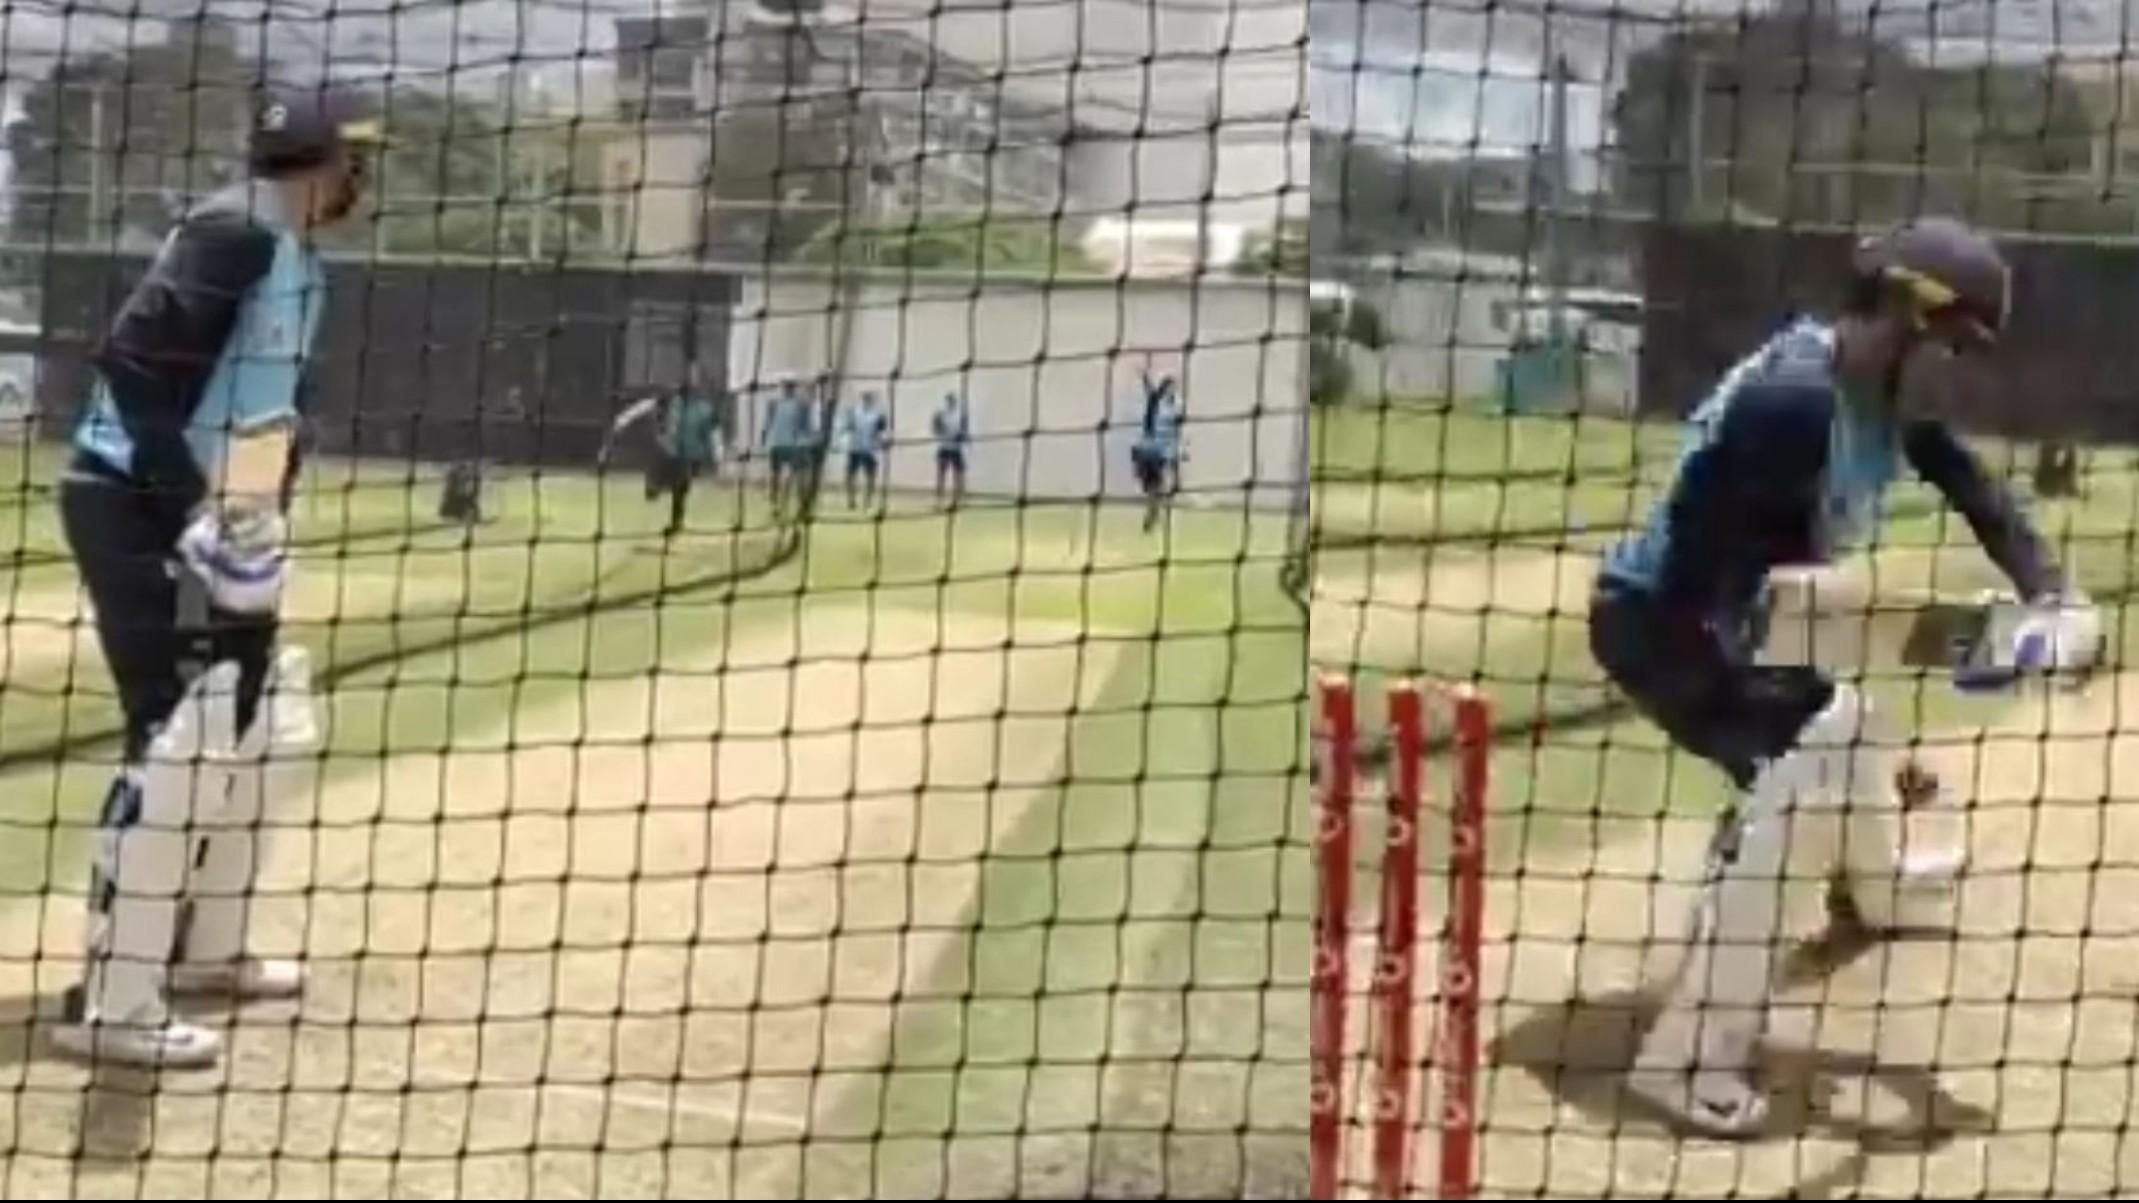 AUS v IND 2020-21: WATCH- Kuldeep Yadav bamboozles Shubman Gill in nets before the Gabba Test